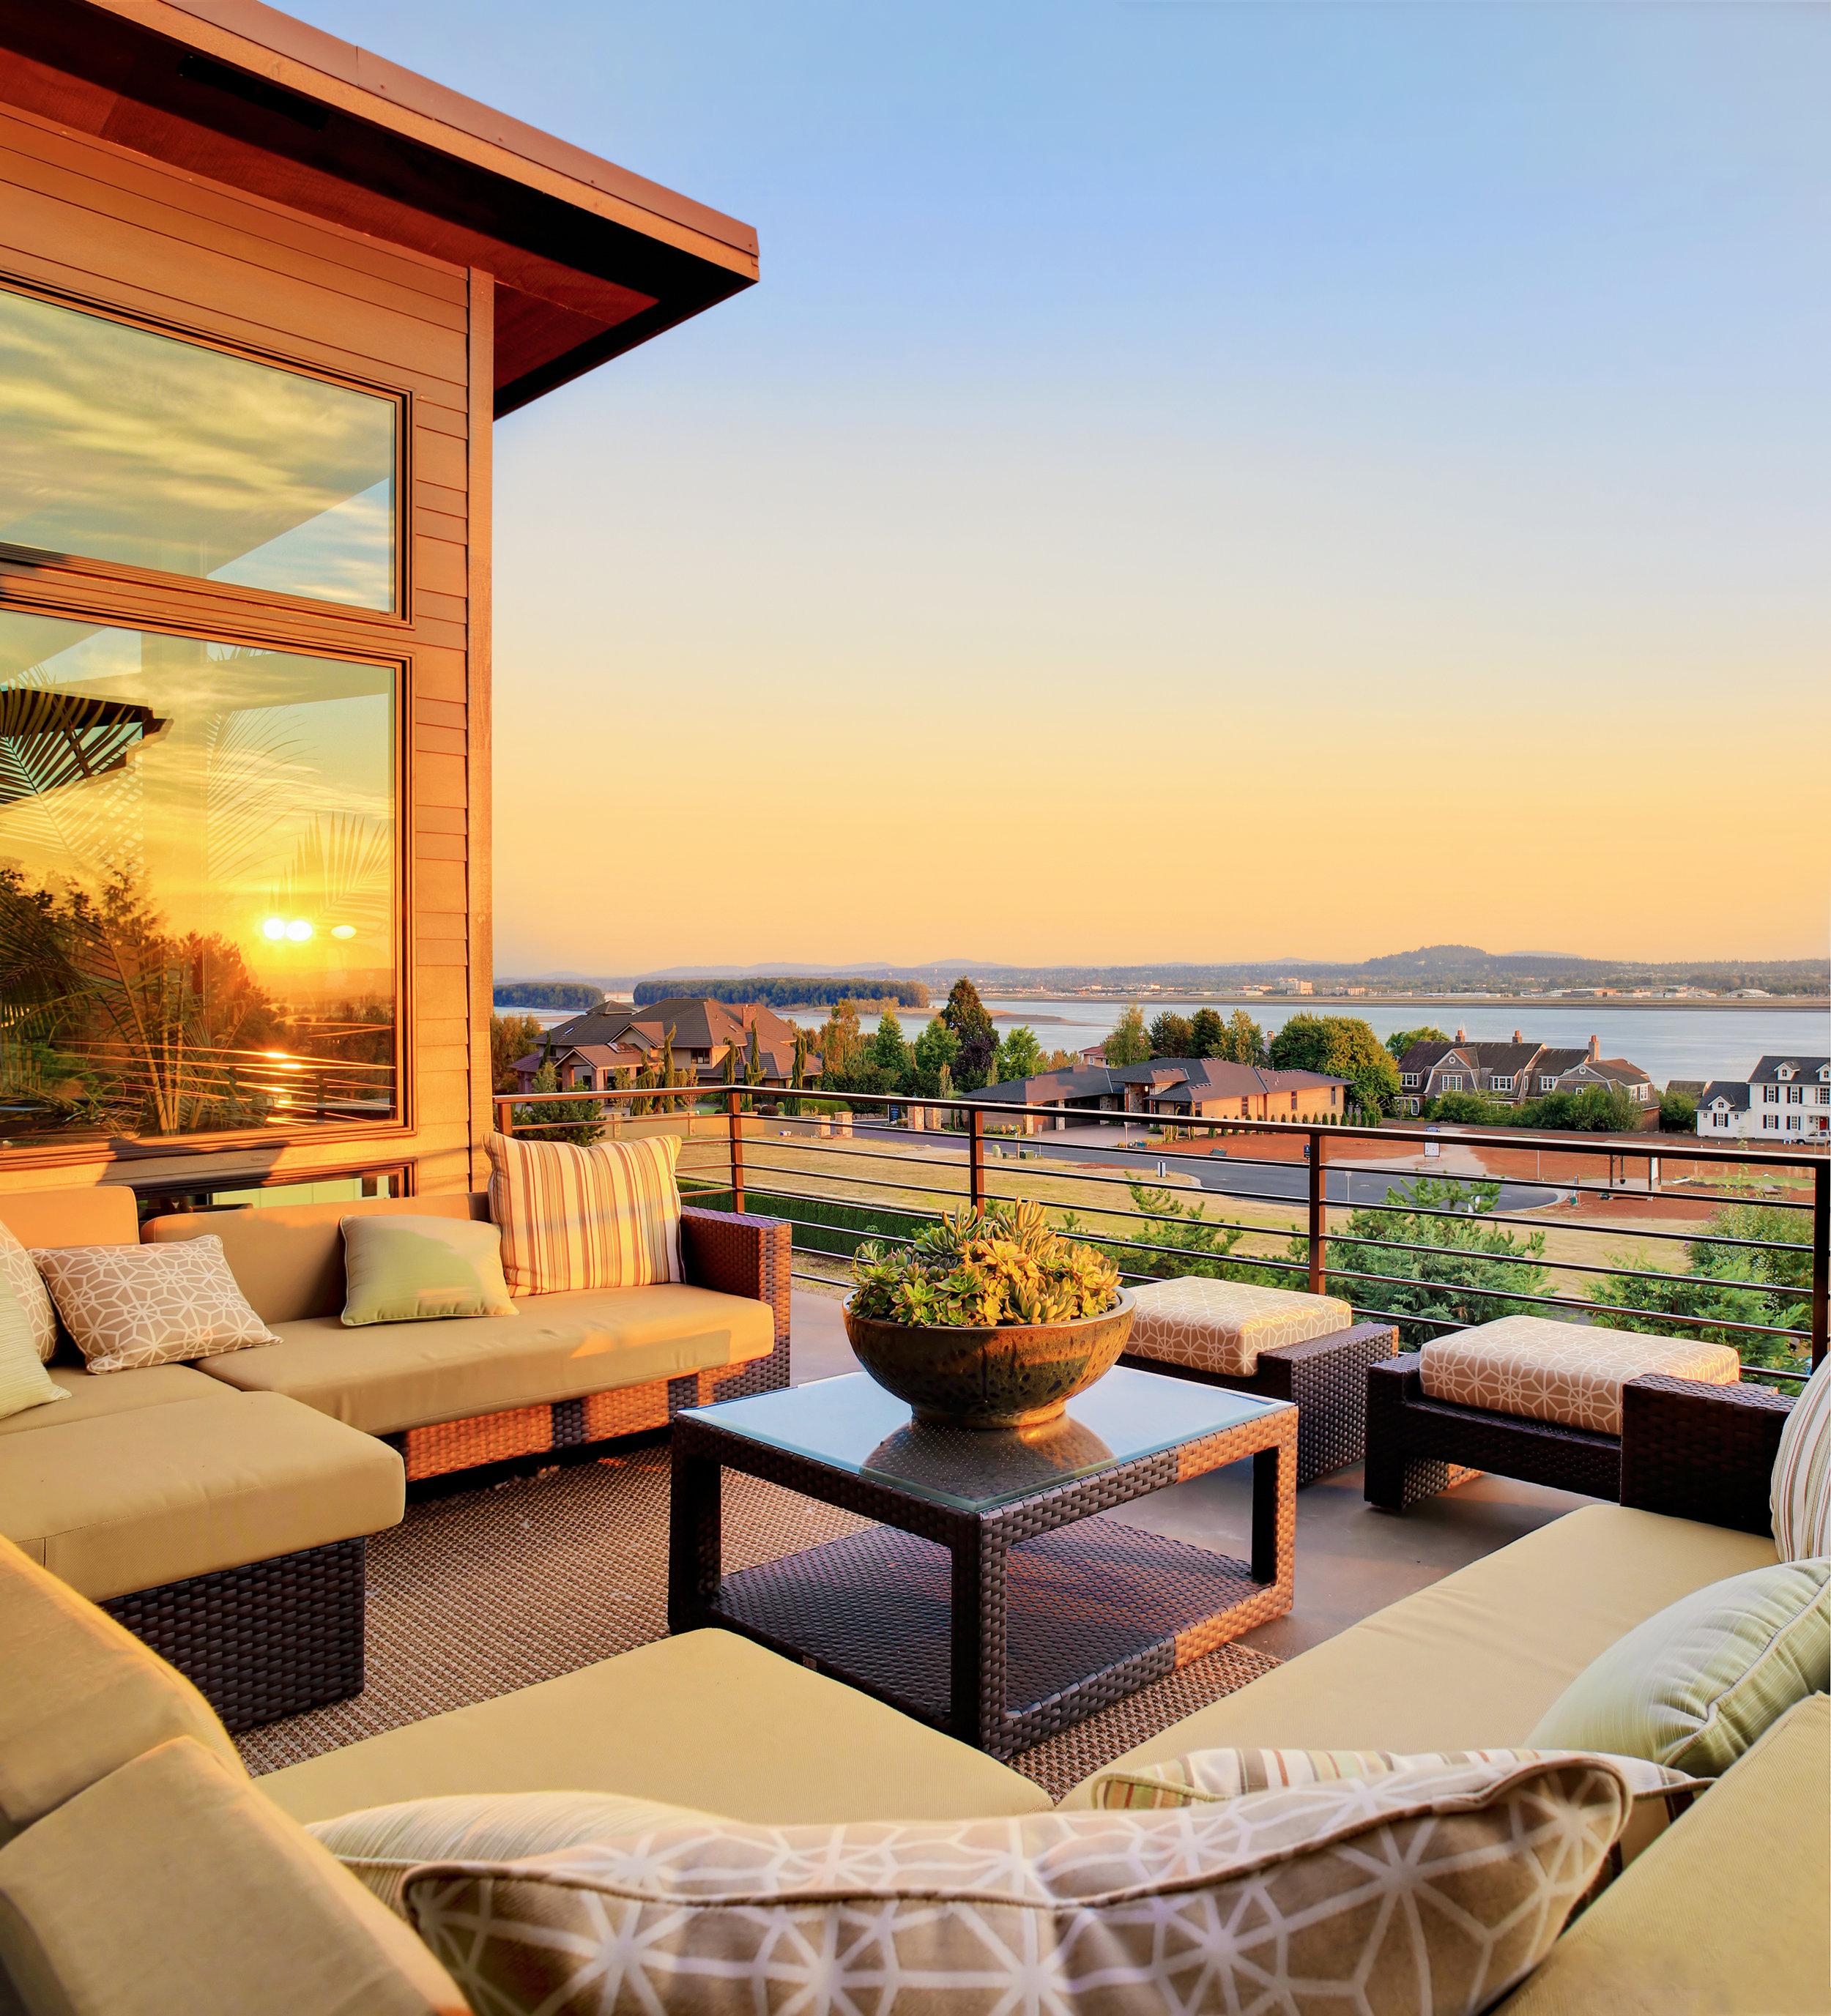 bigstock-Beautiful-Home-Exterior-Patio--61868861.jpg